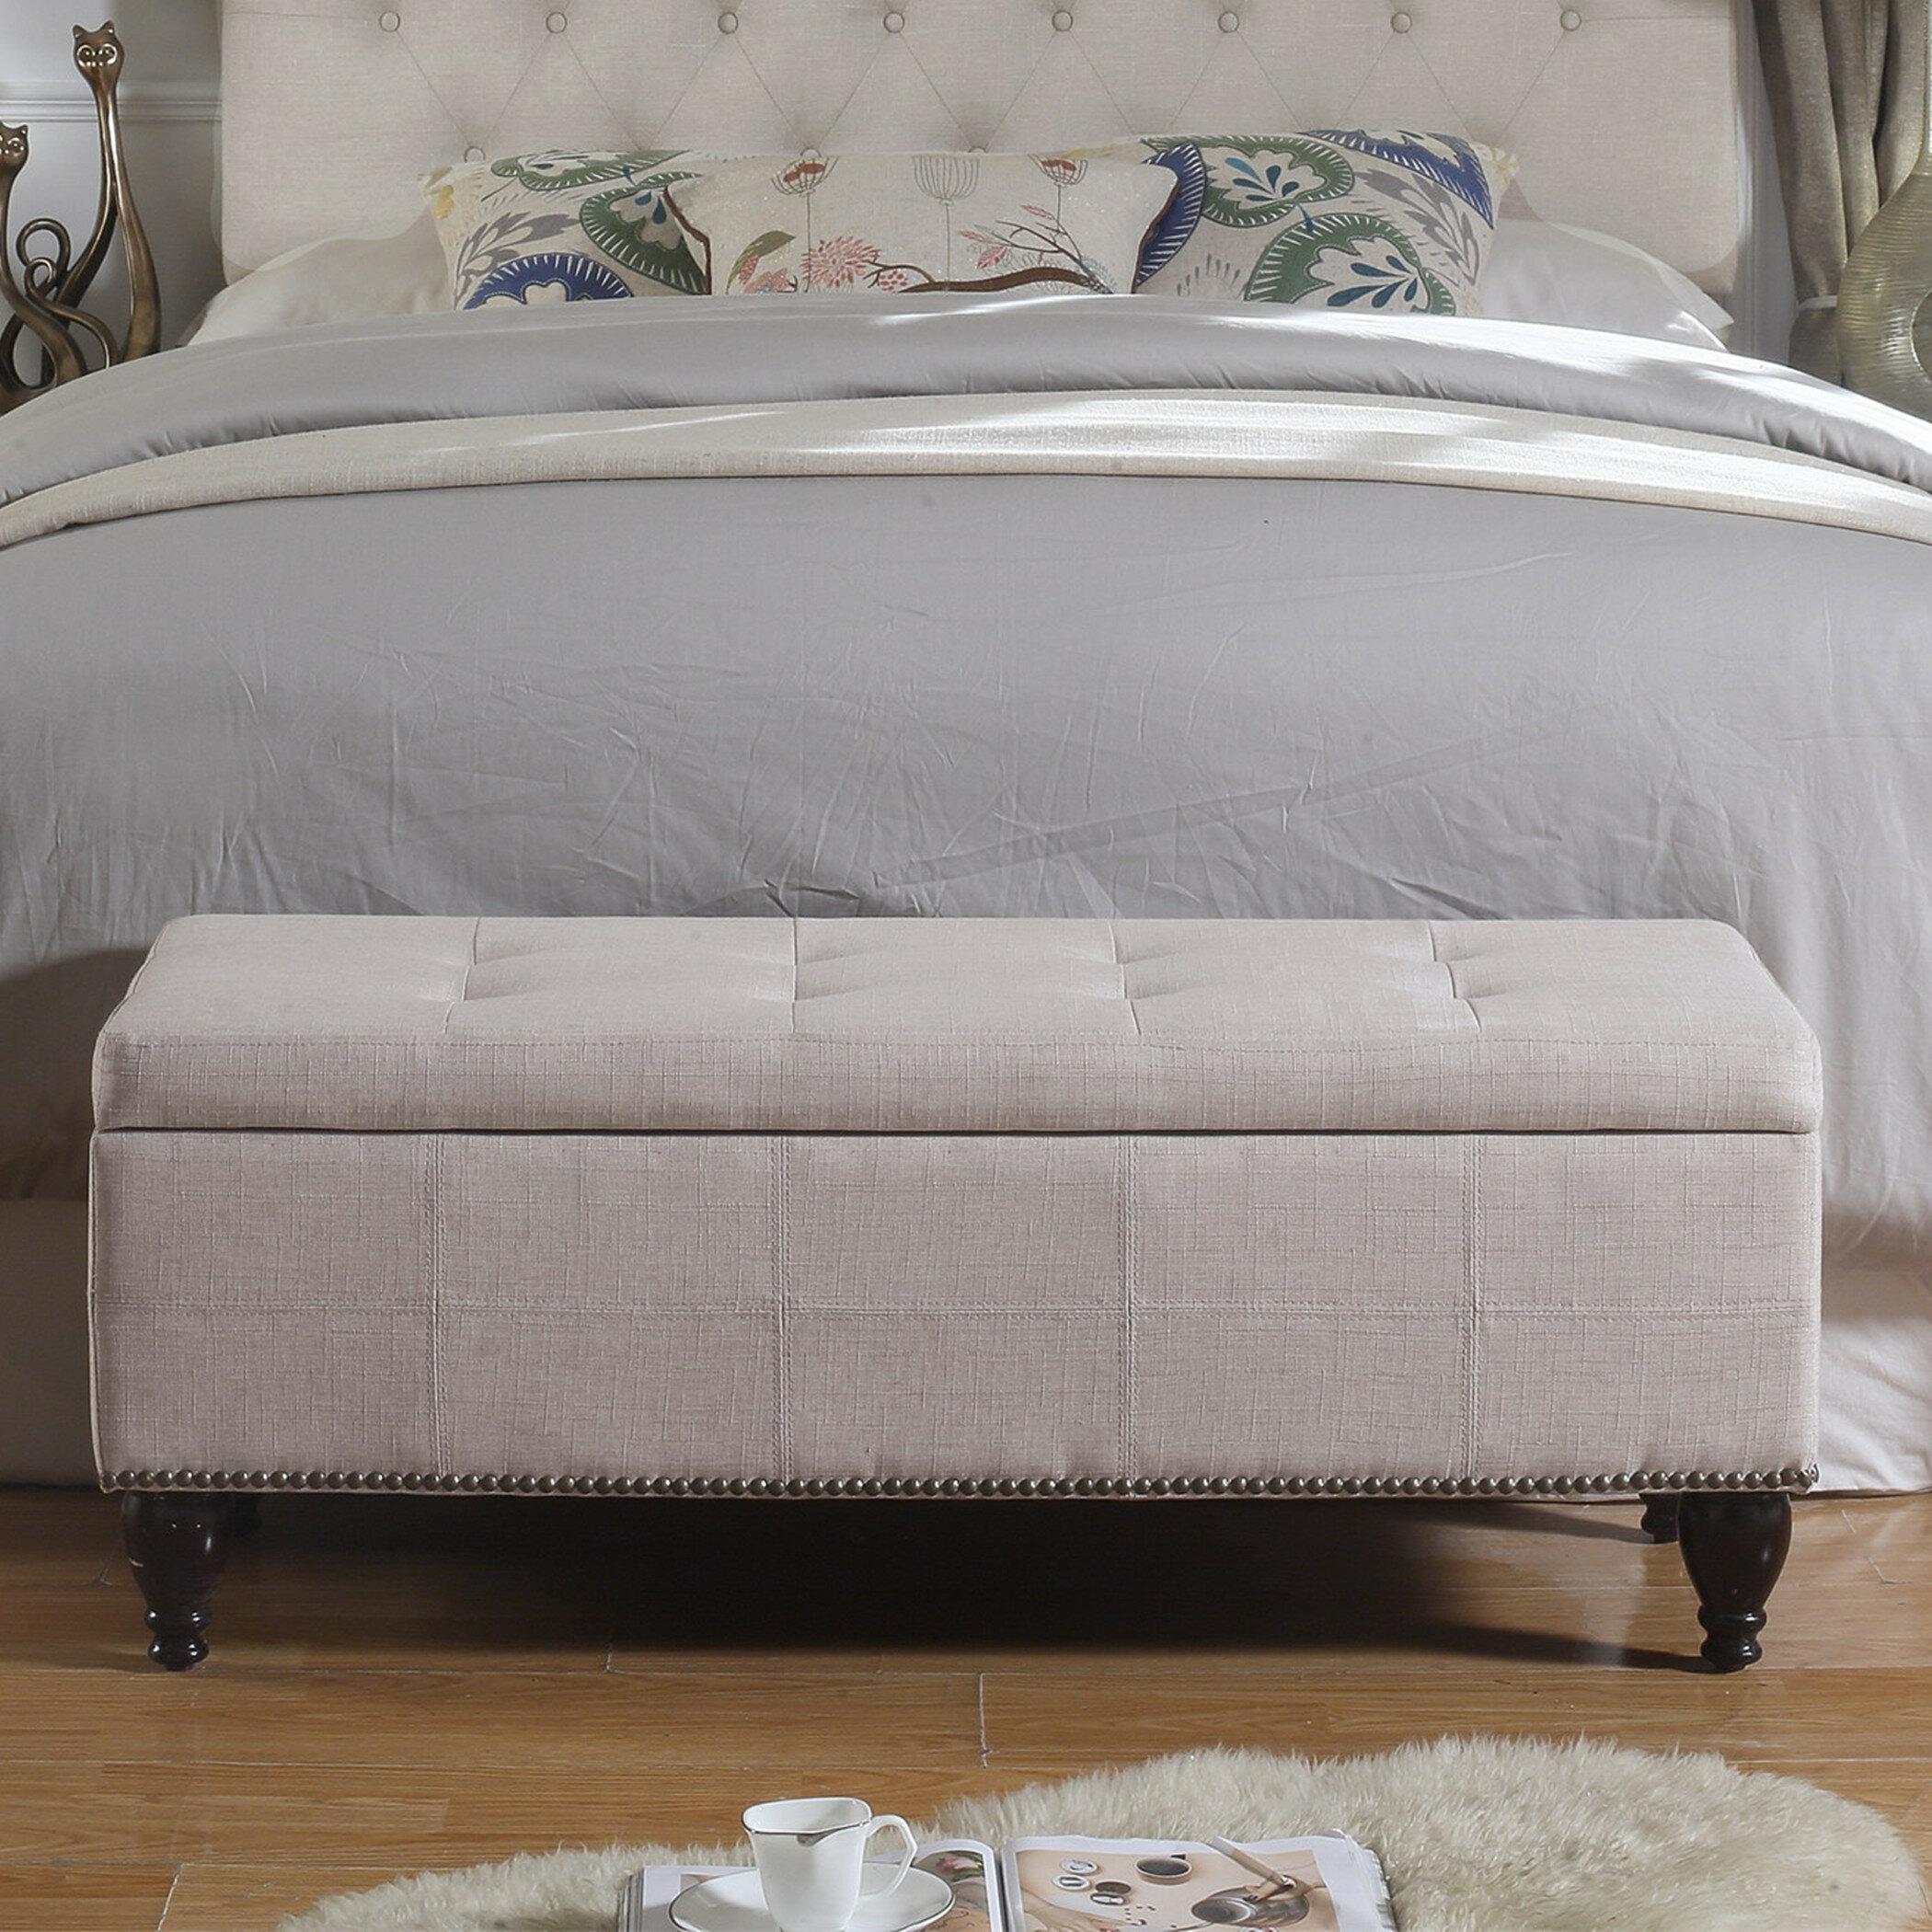 Charlton Home Darrah Upholstered Storage Bench & Reviews | Wayfair